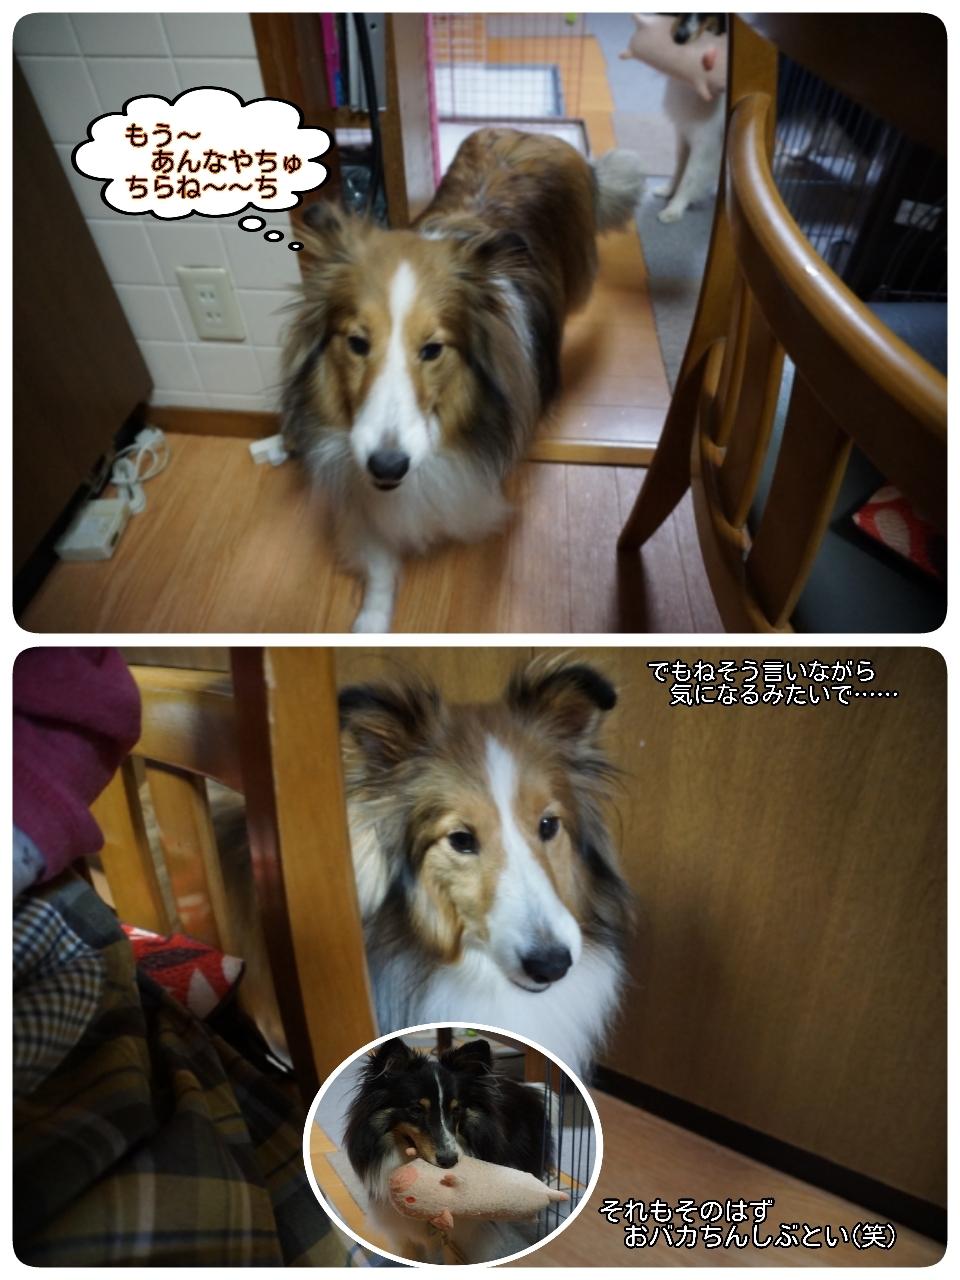 16-12-01-11-26-08-361_deco.jpg